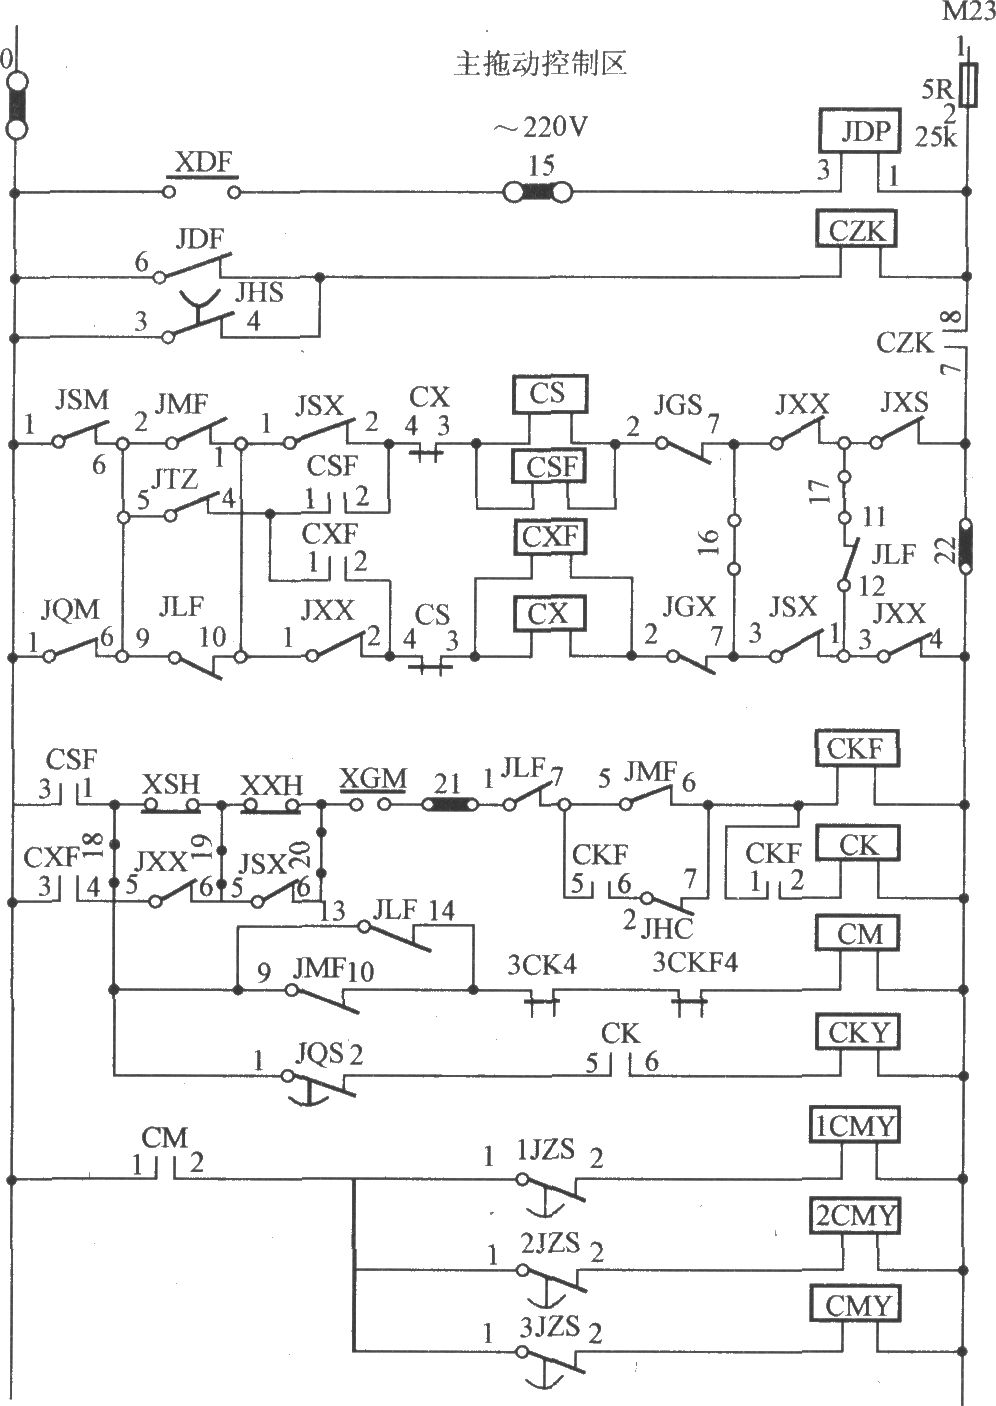 medium resolution of lift control wiring diagram wiring diagram detailed 2007 gmc yukon wiring diagram lift wiring diagram